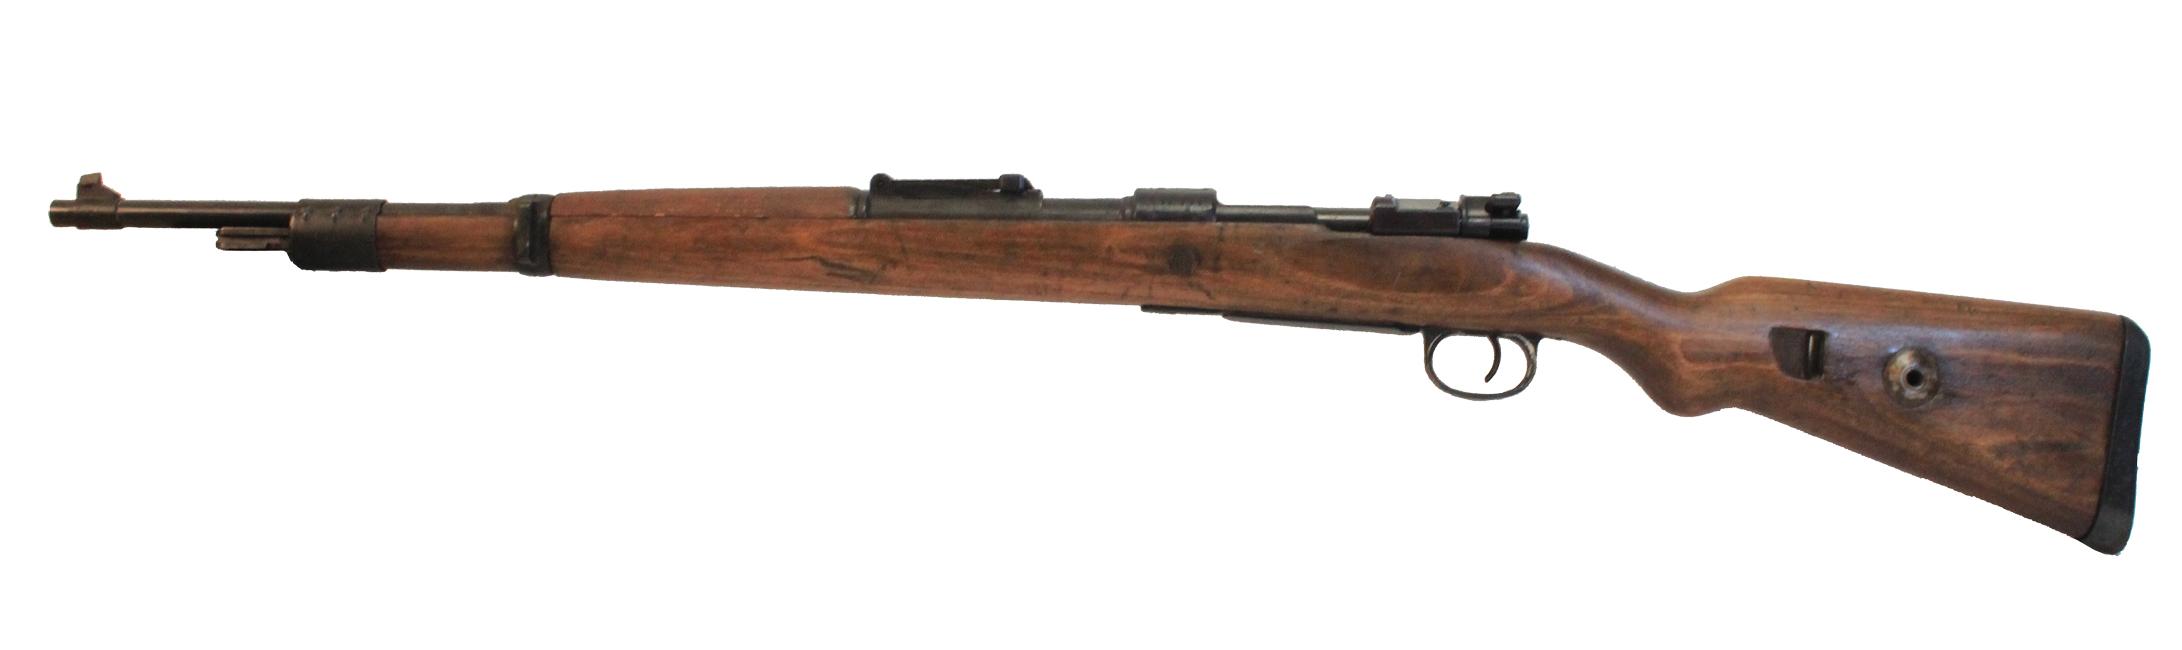 Expanzní puška mauser k98